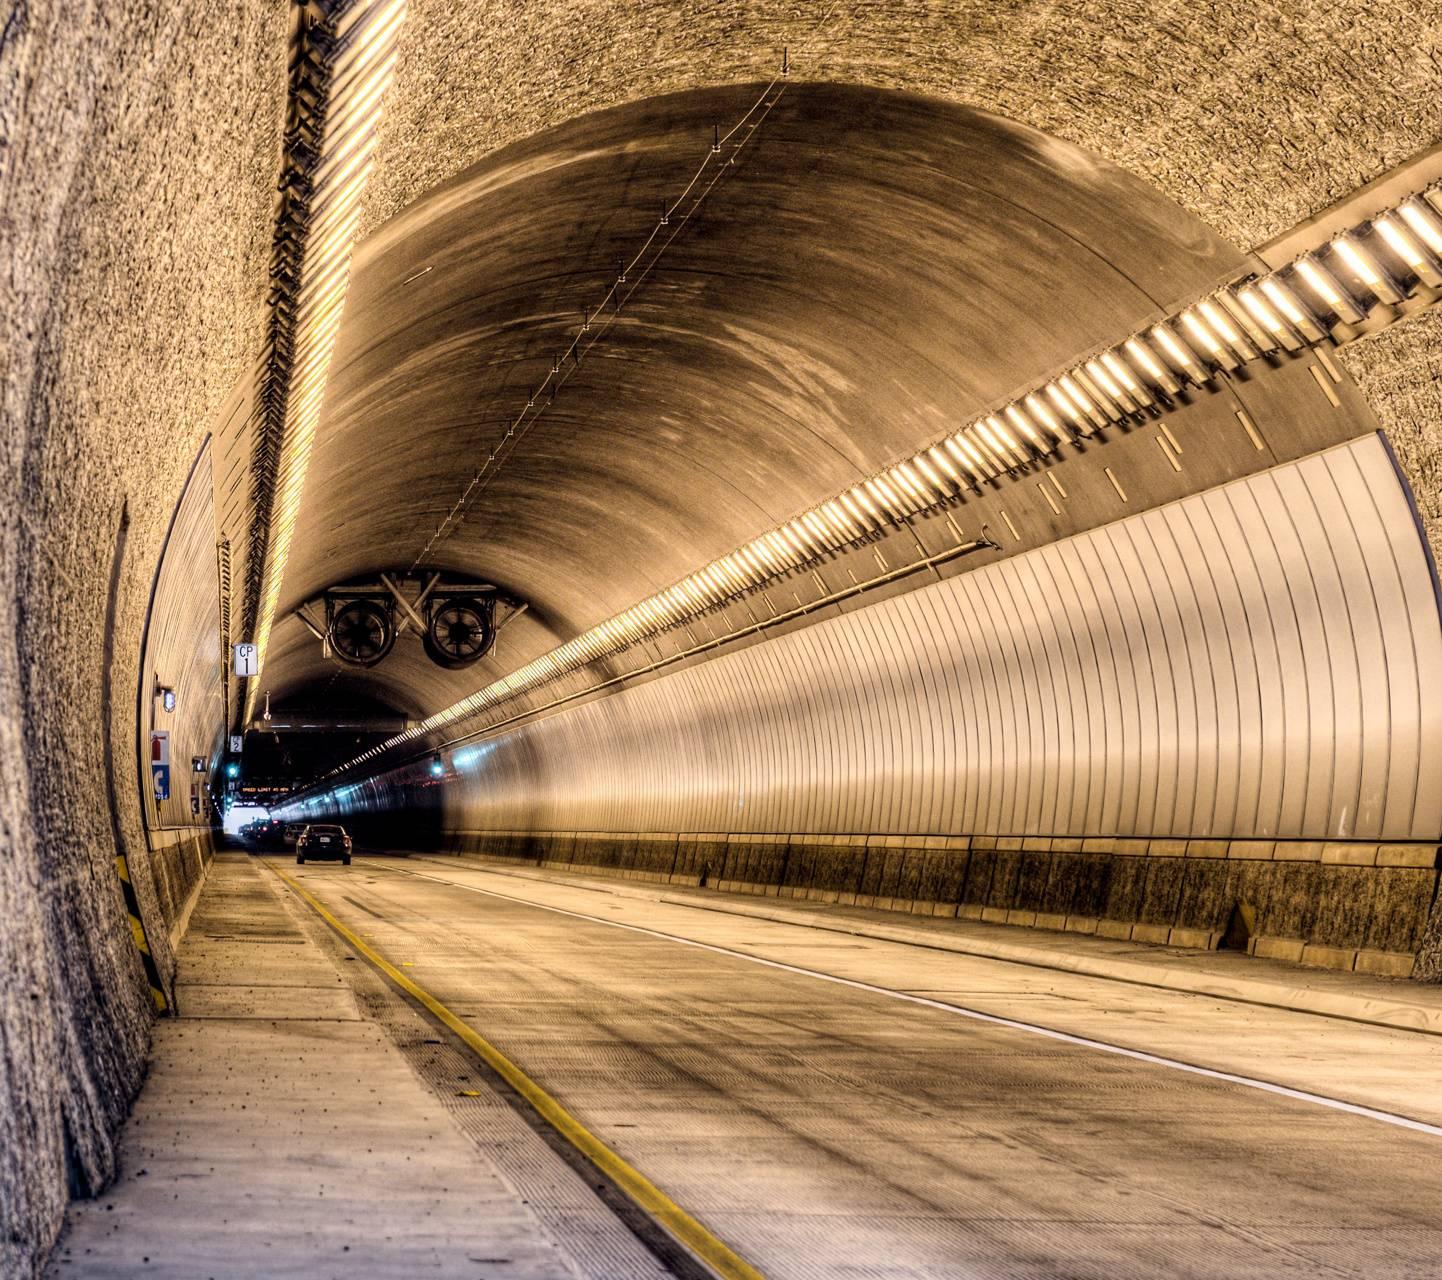 Tom Lantos Tunnel